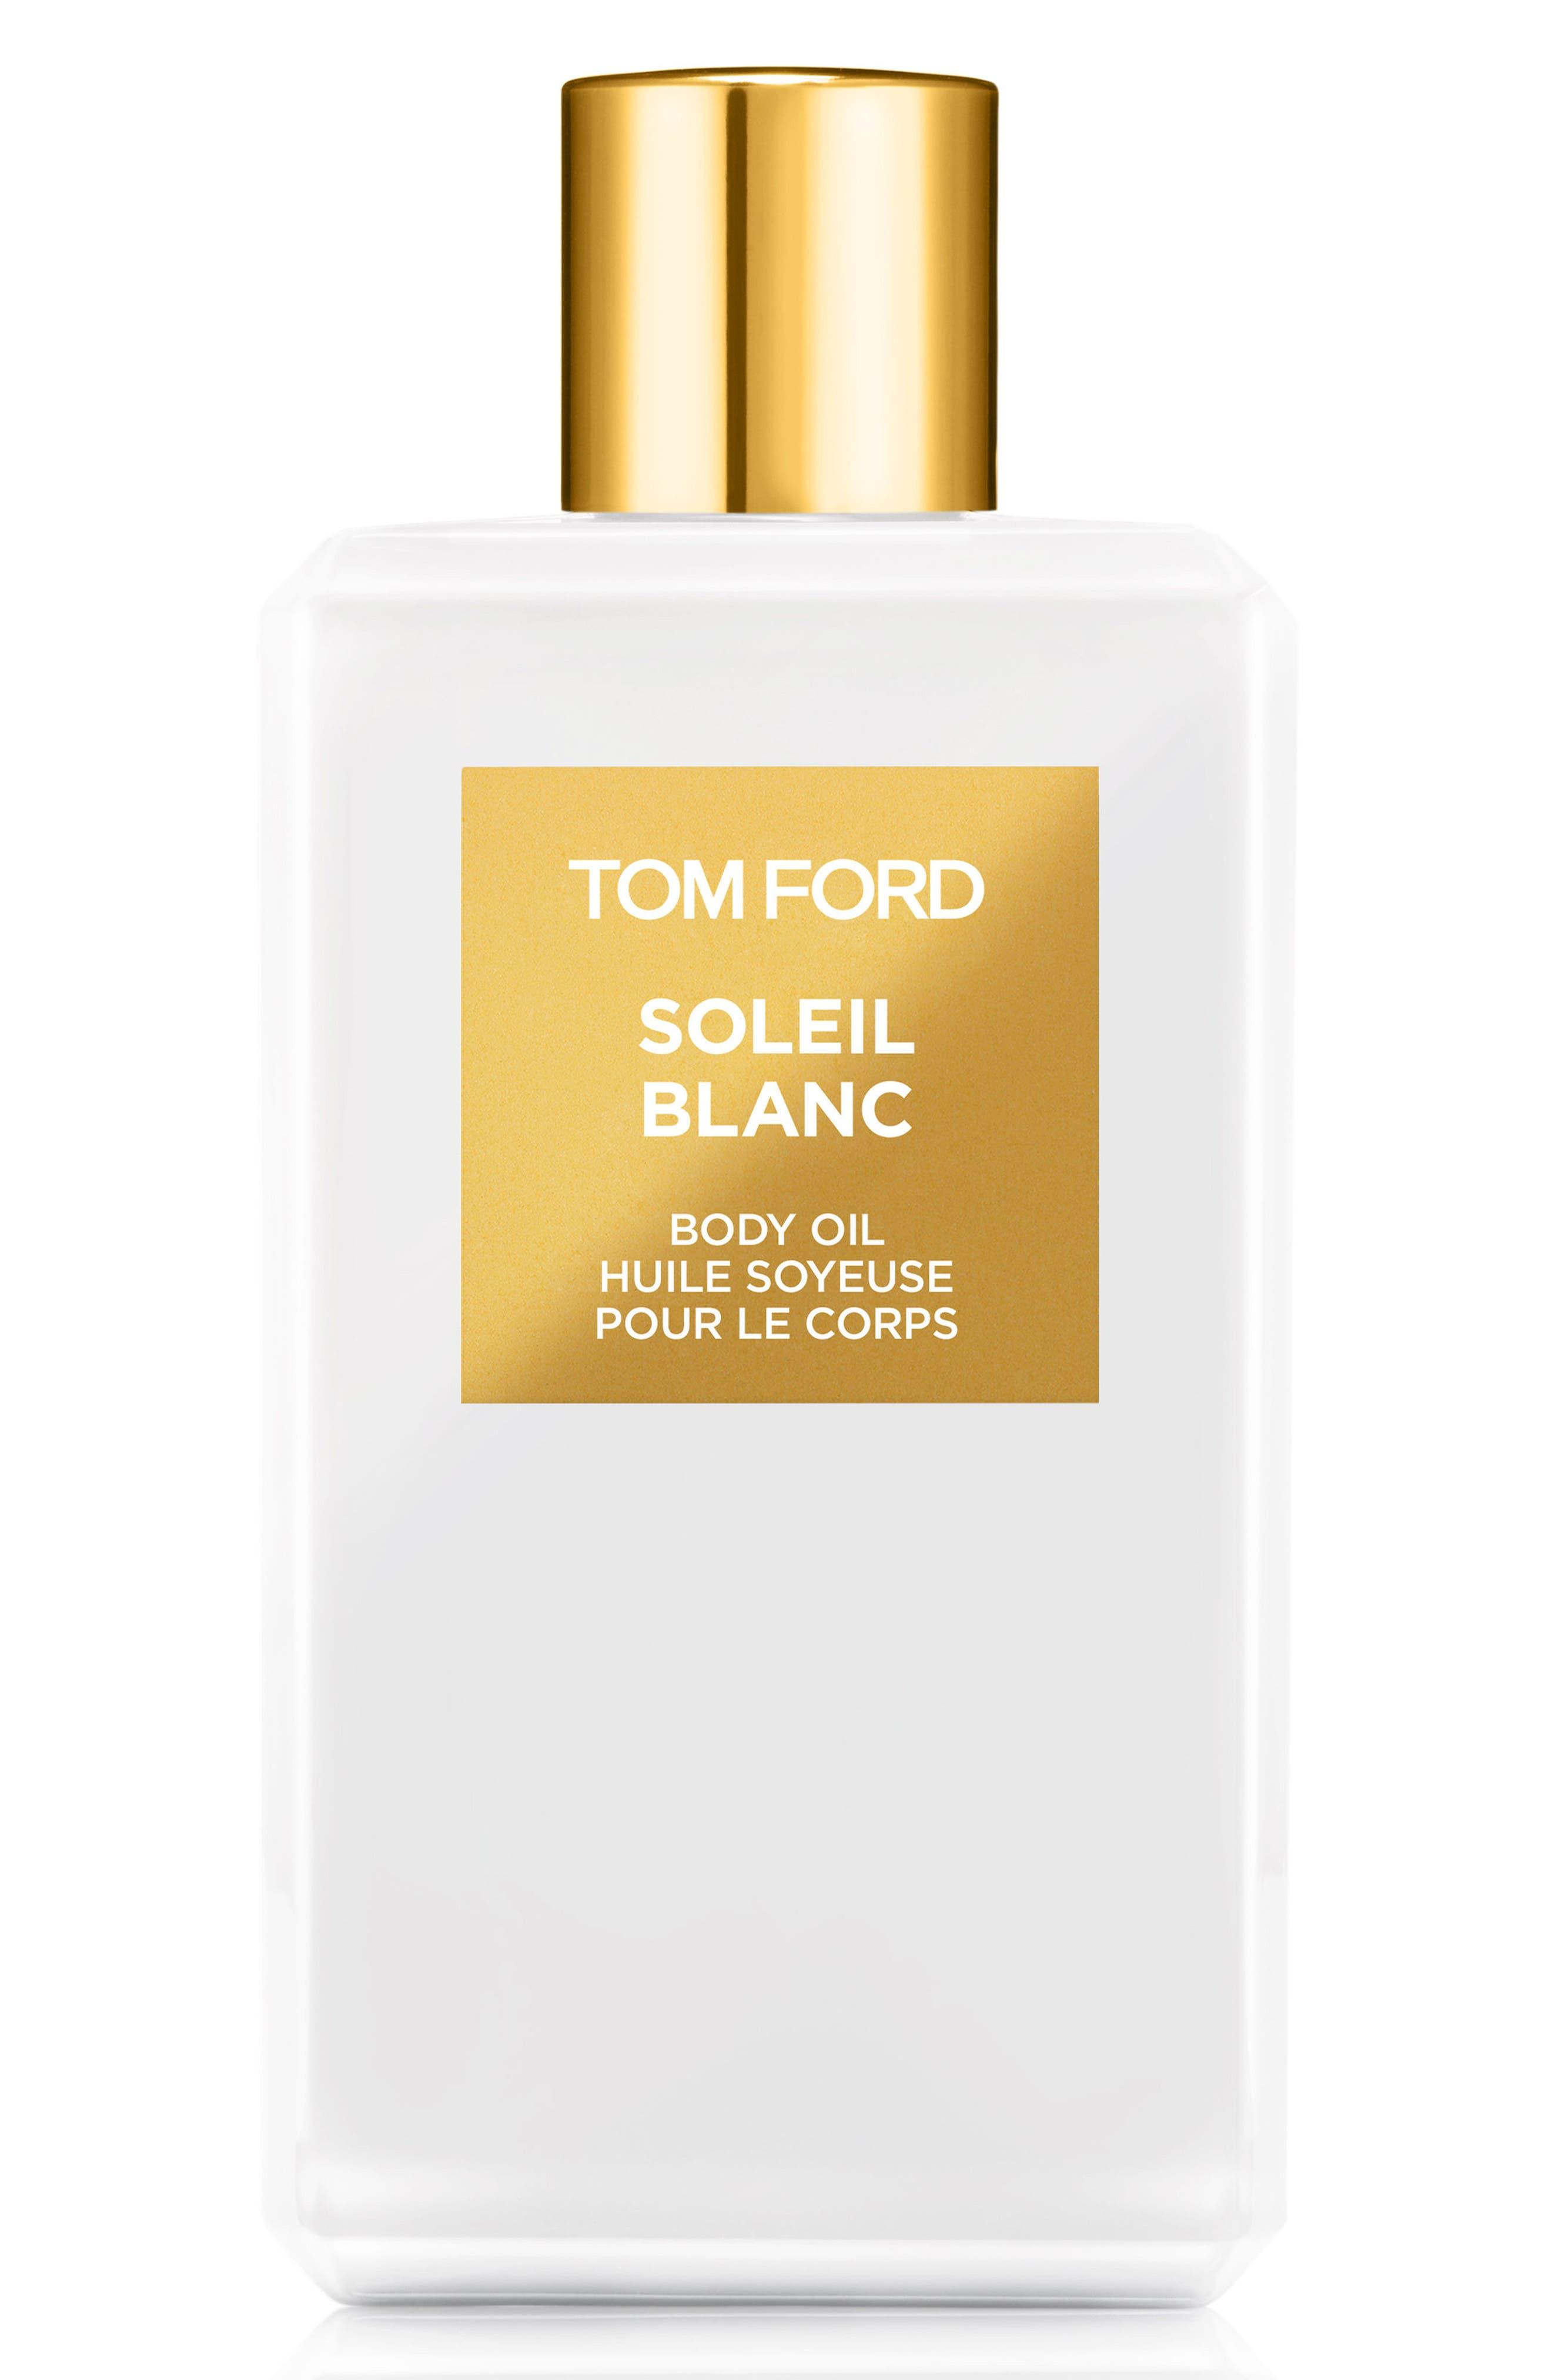 Tom Ford Private Blend Soleil Blanc Body Oil